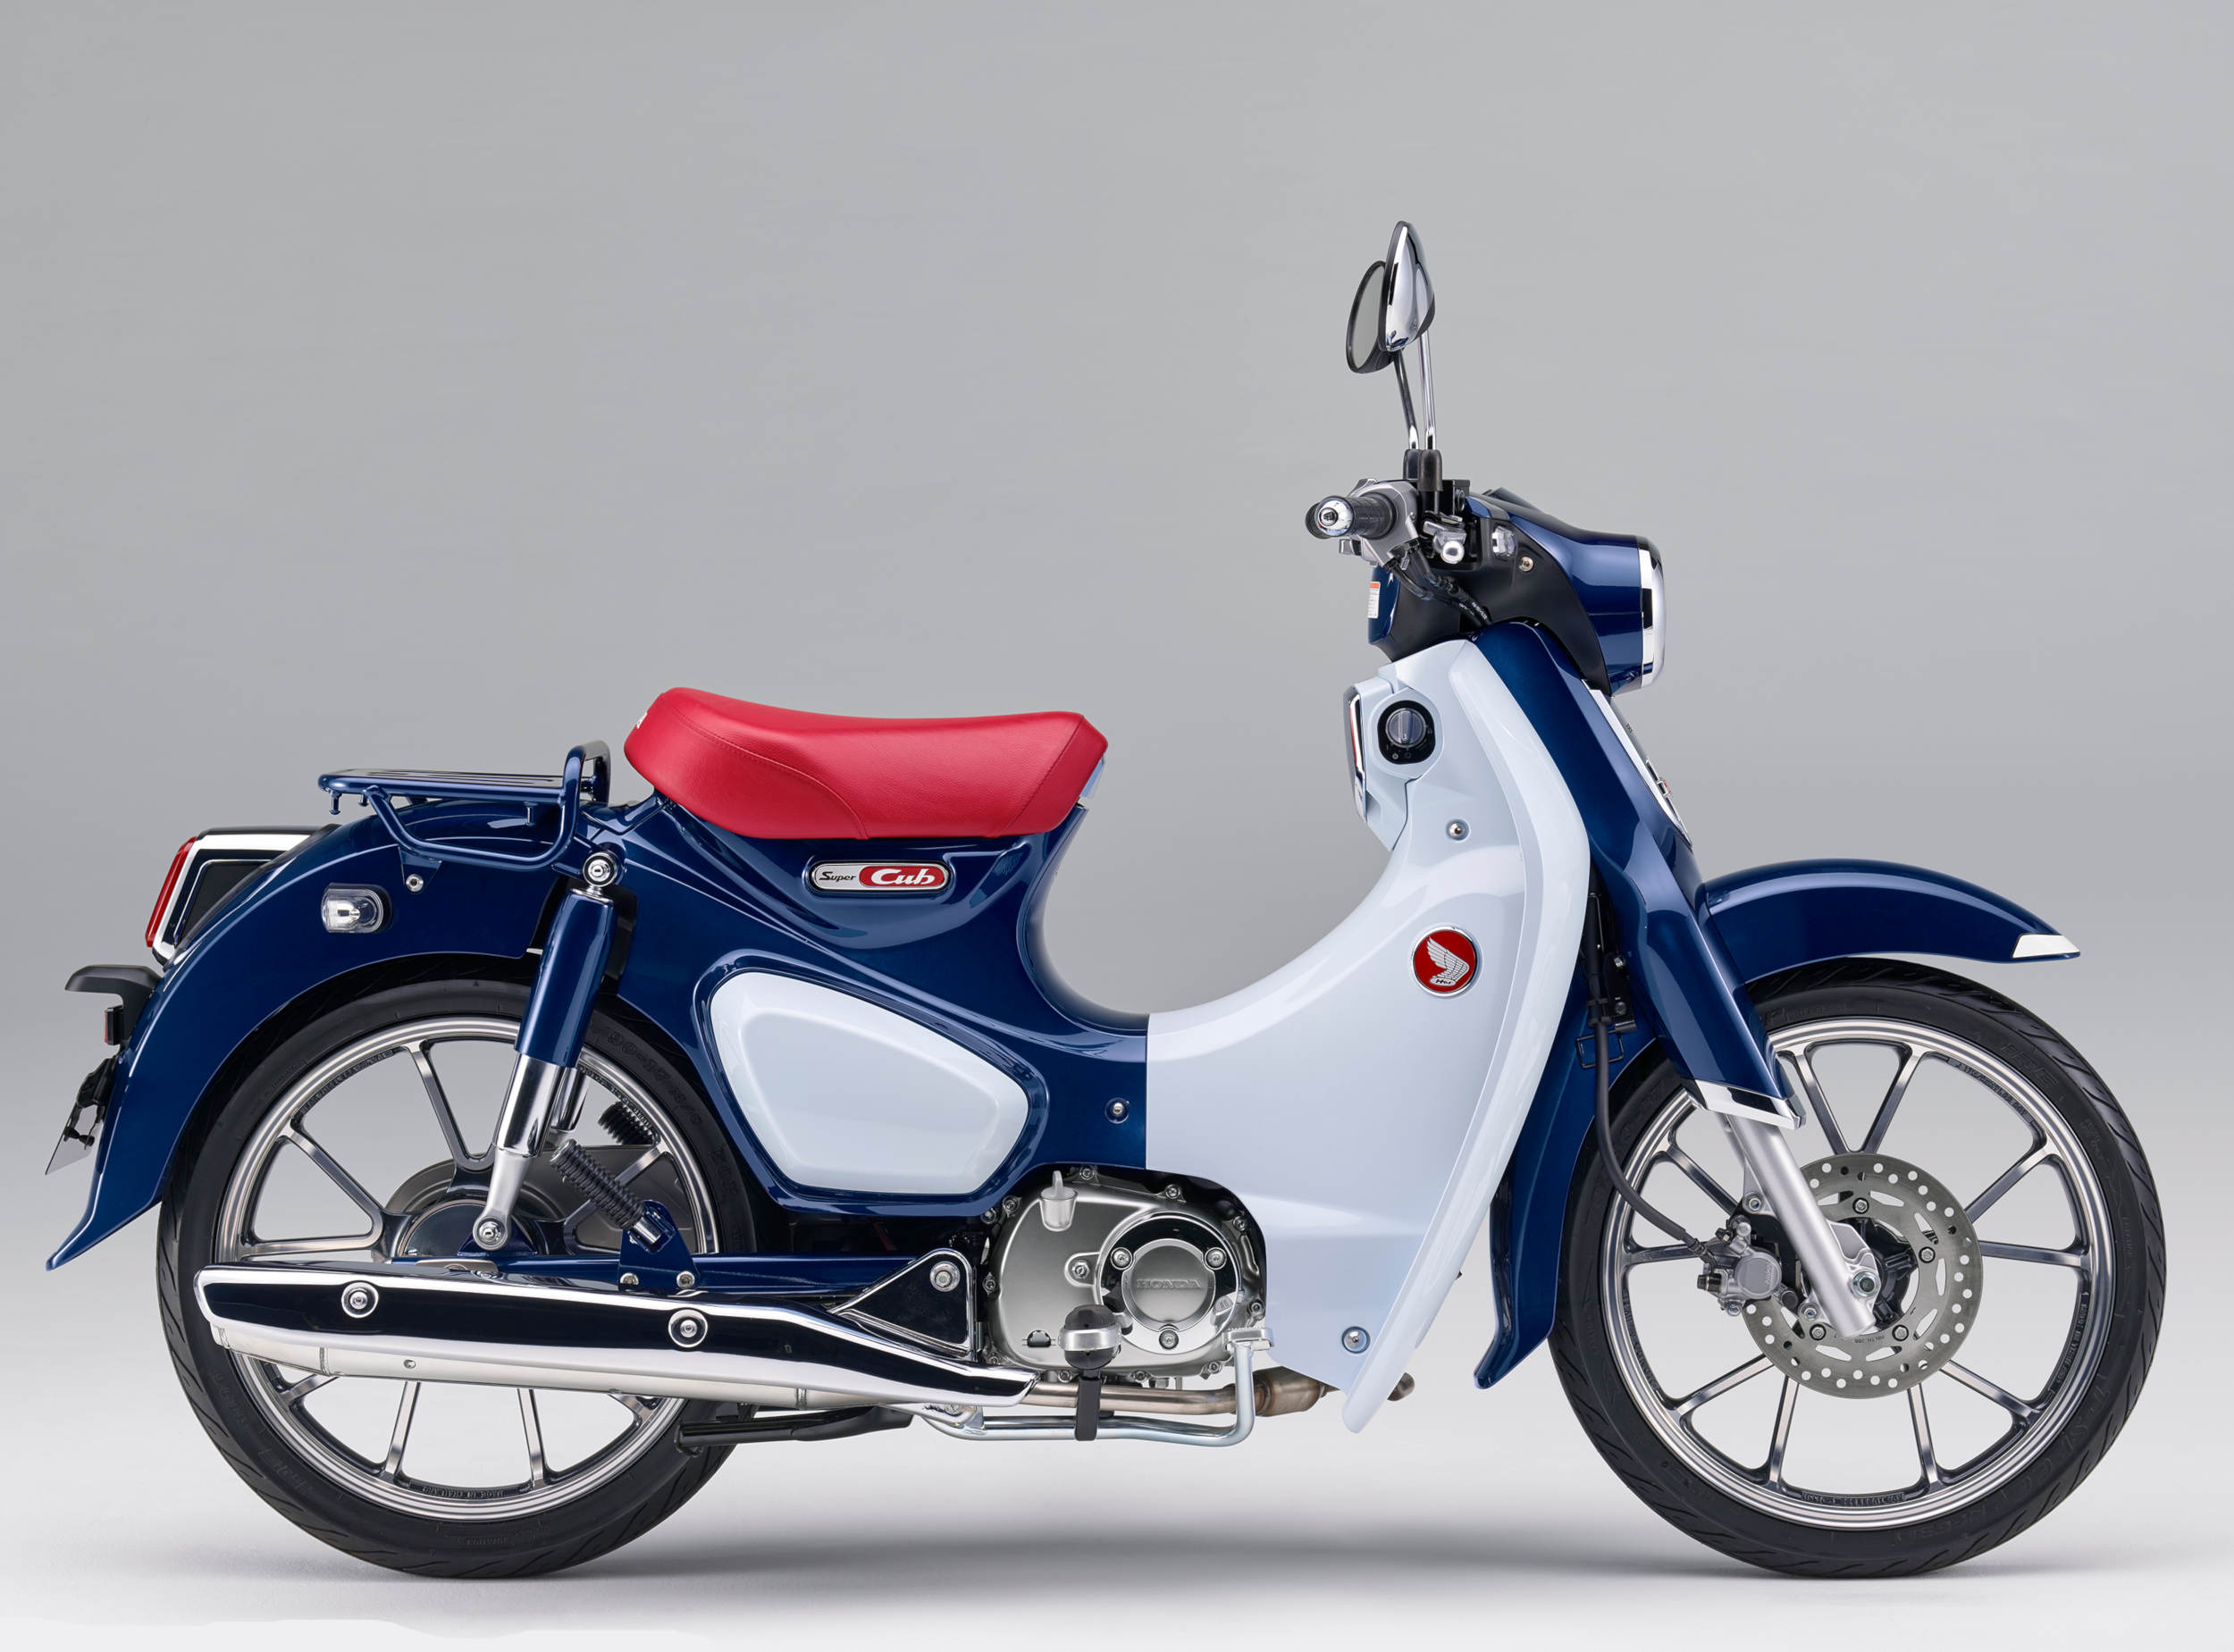 Honda Monkey And Super Cub Coming To Us Market As 2019 Models